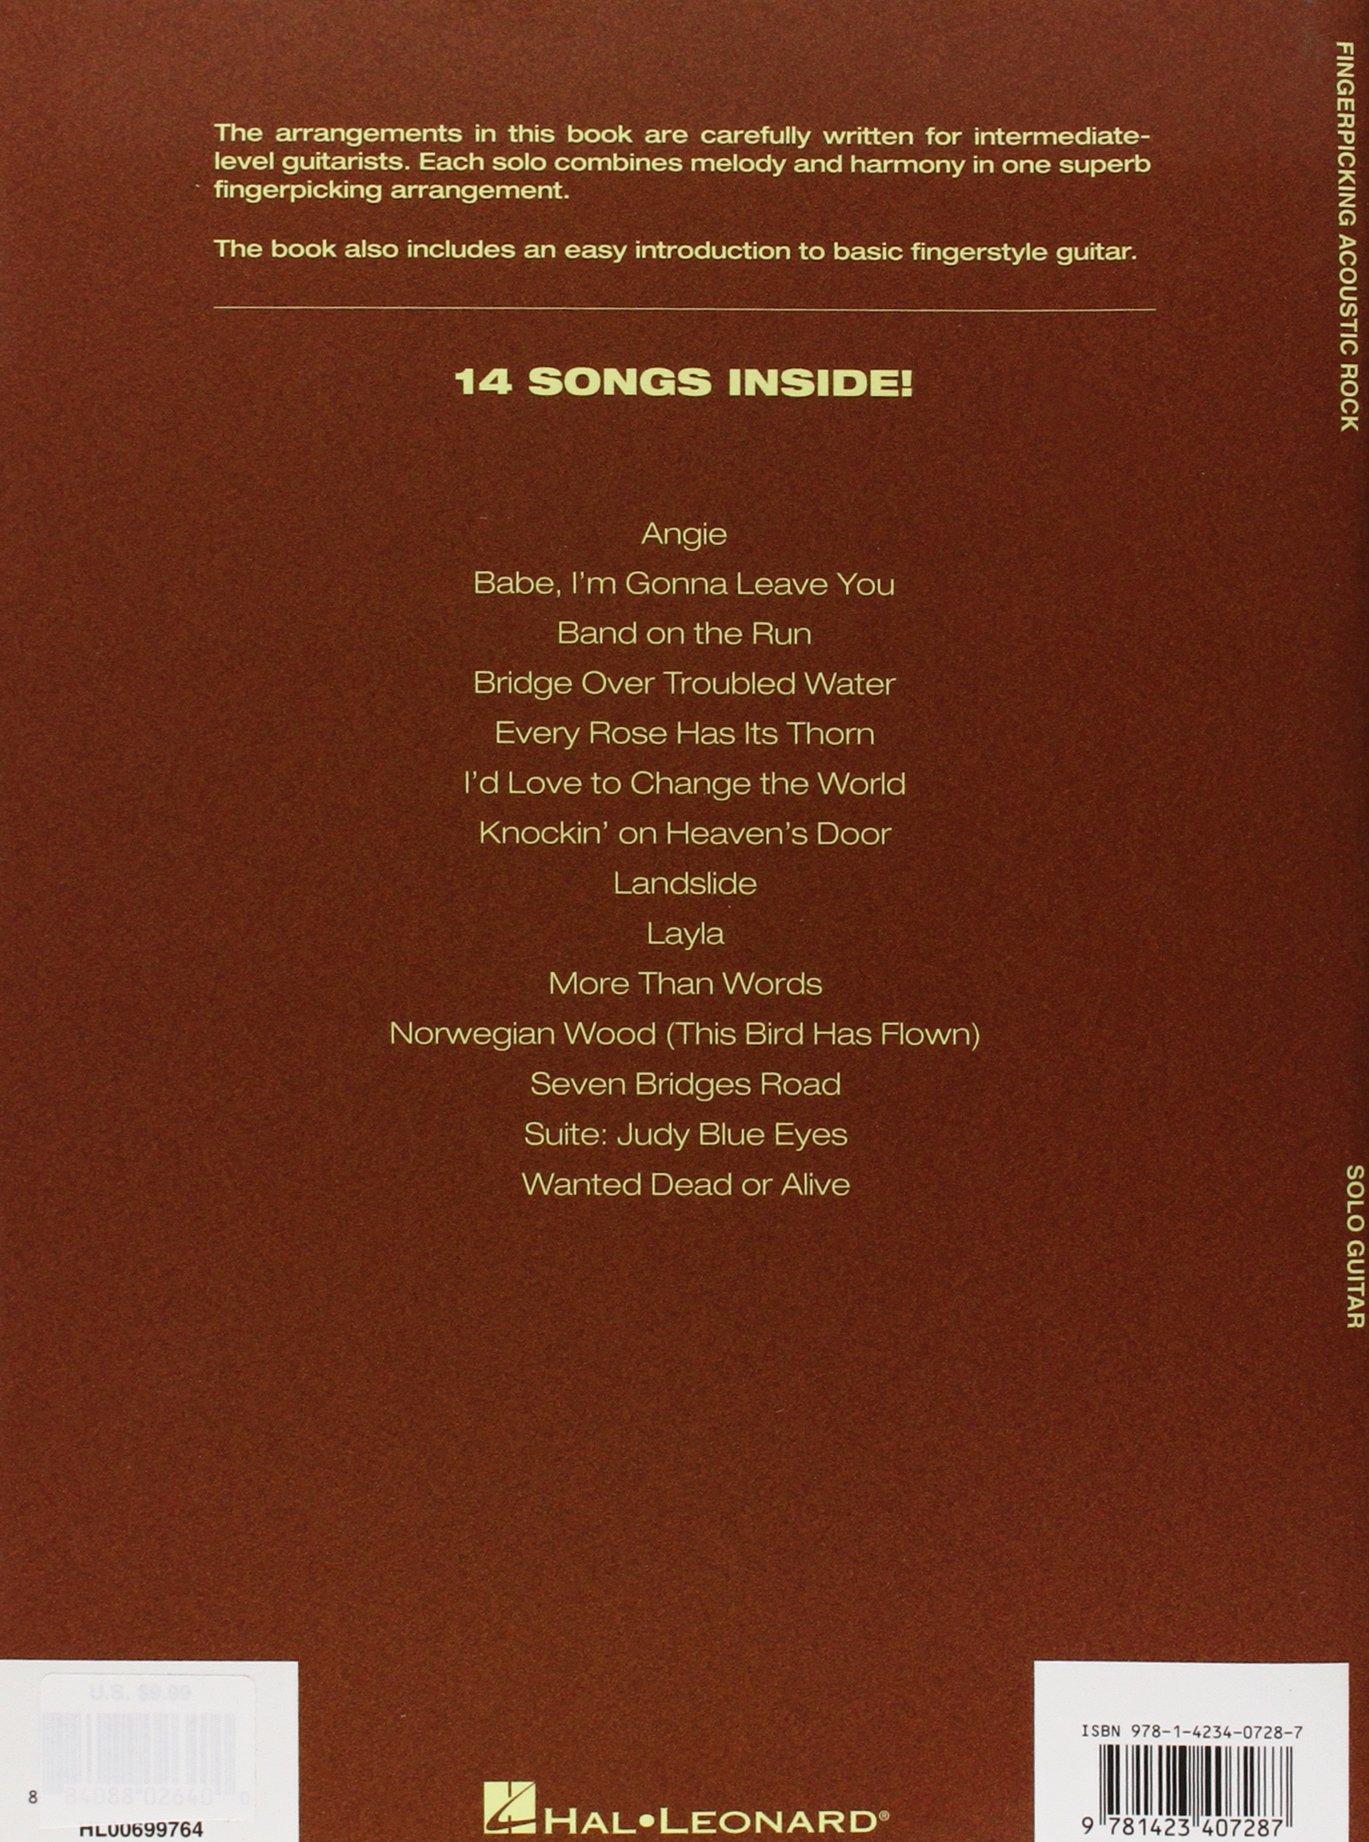 Amazon Fingerpicking Acoustic Rock 14 Songs Arranged For Solo